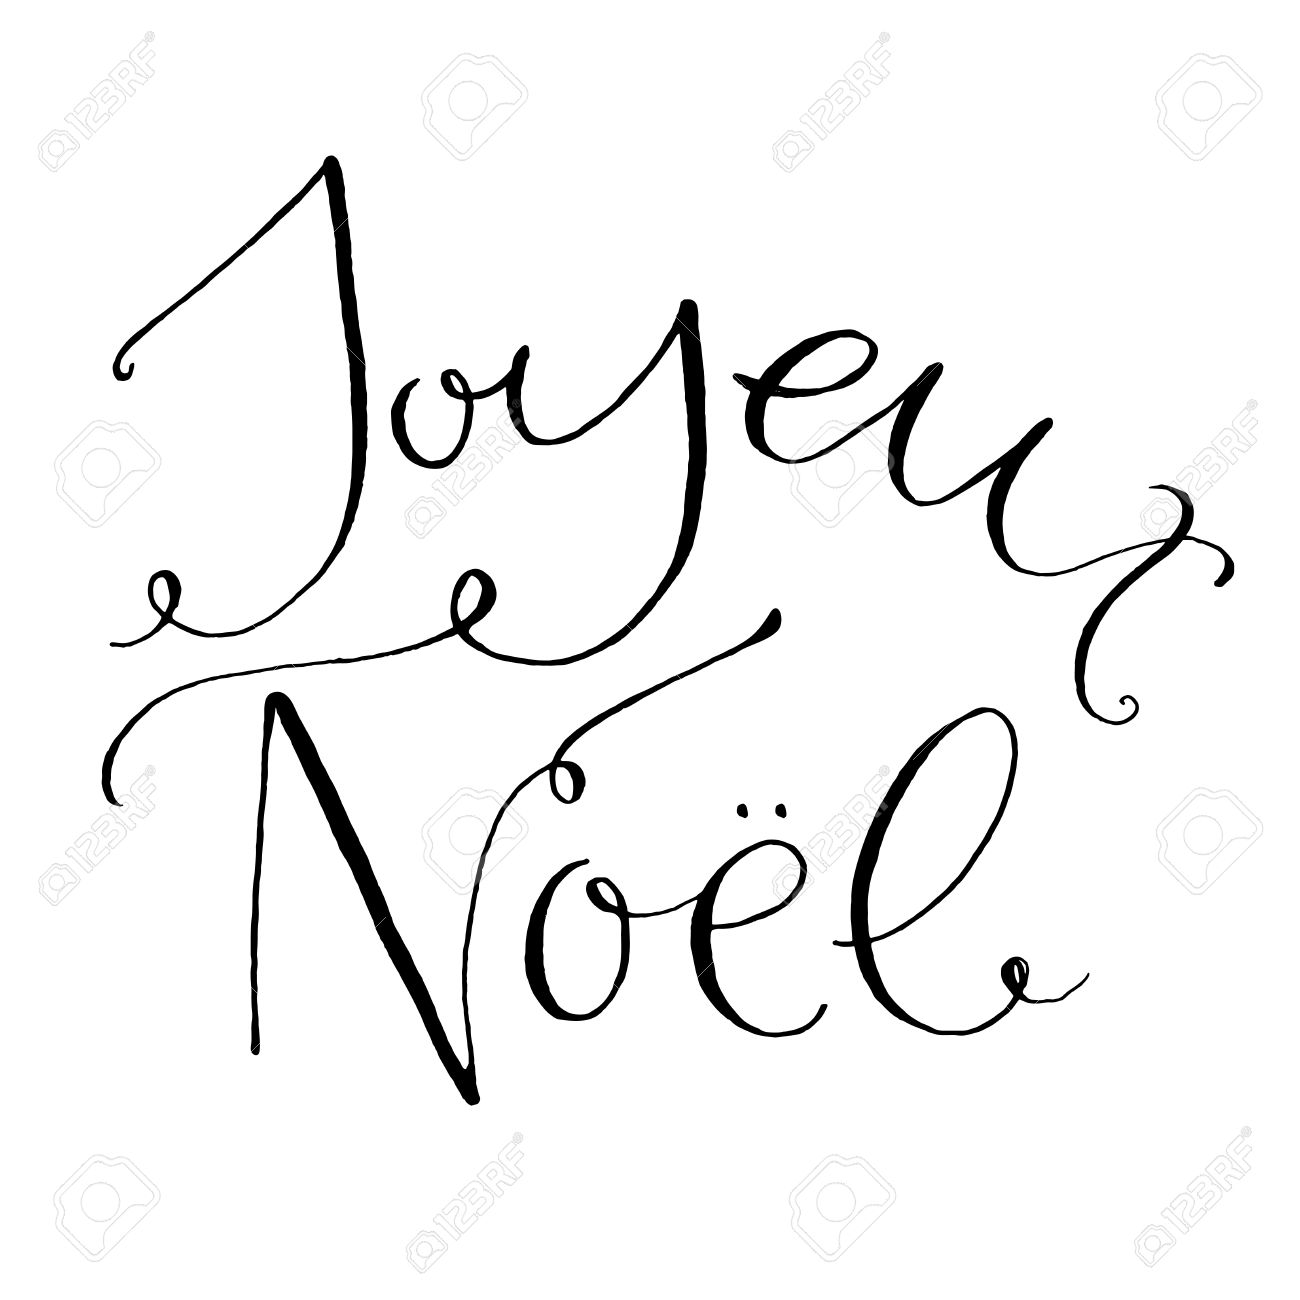 Joyeux Noel Frase Francés Significa Feliz Navidad Caligrafía Caprichosa